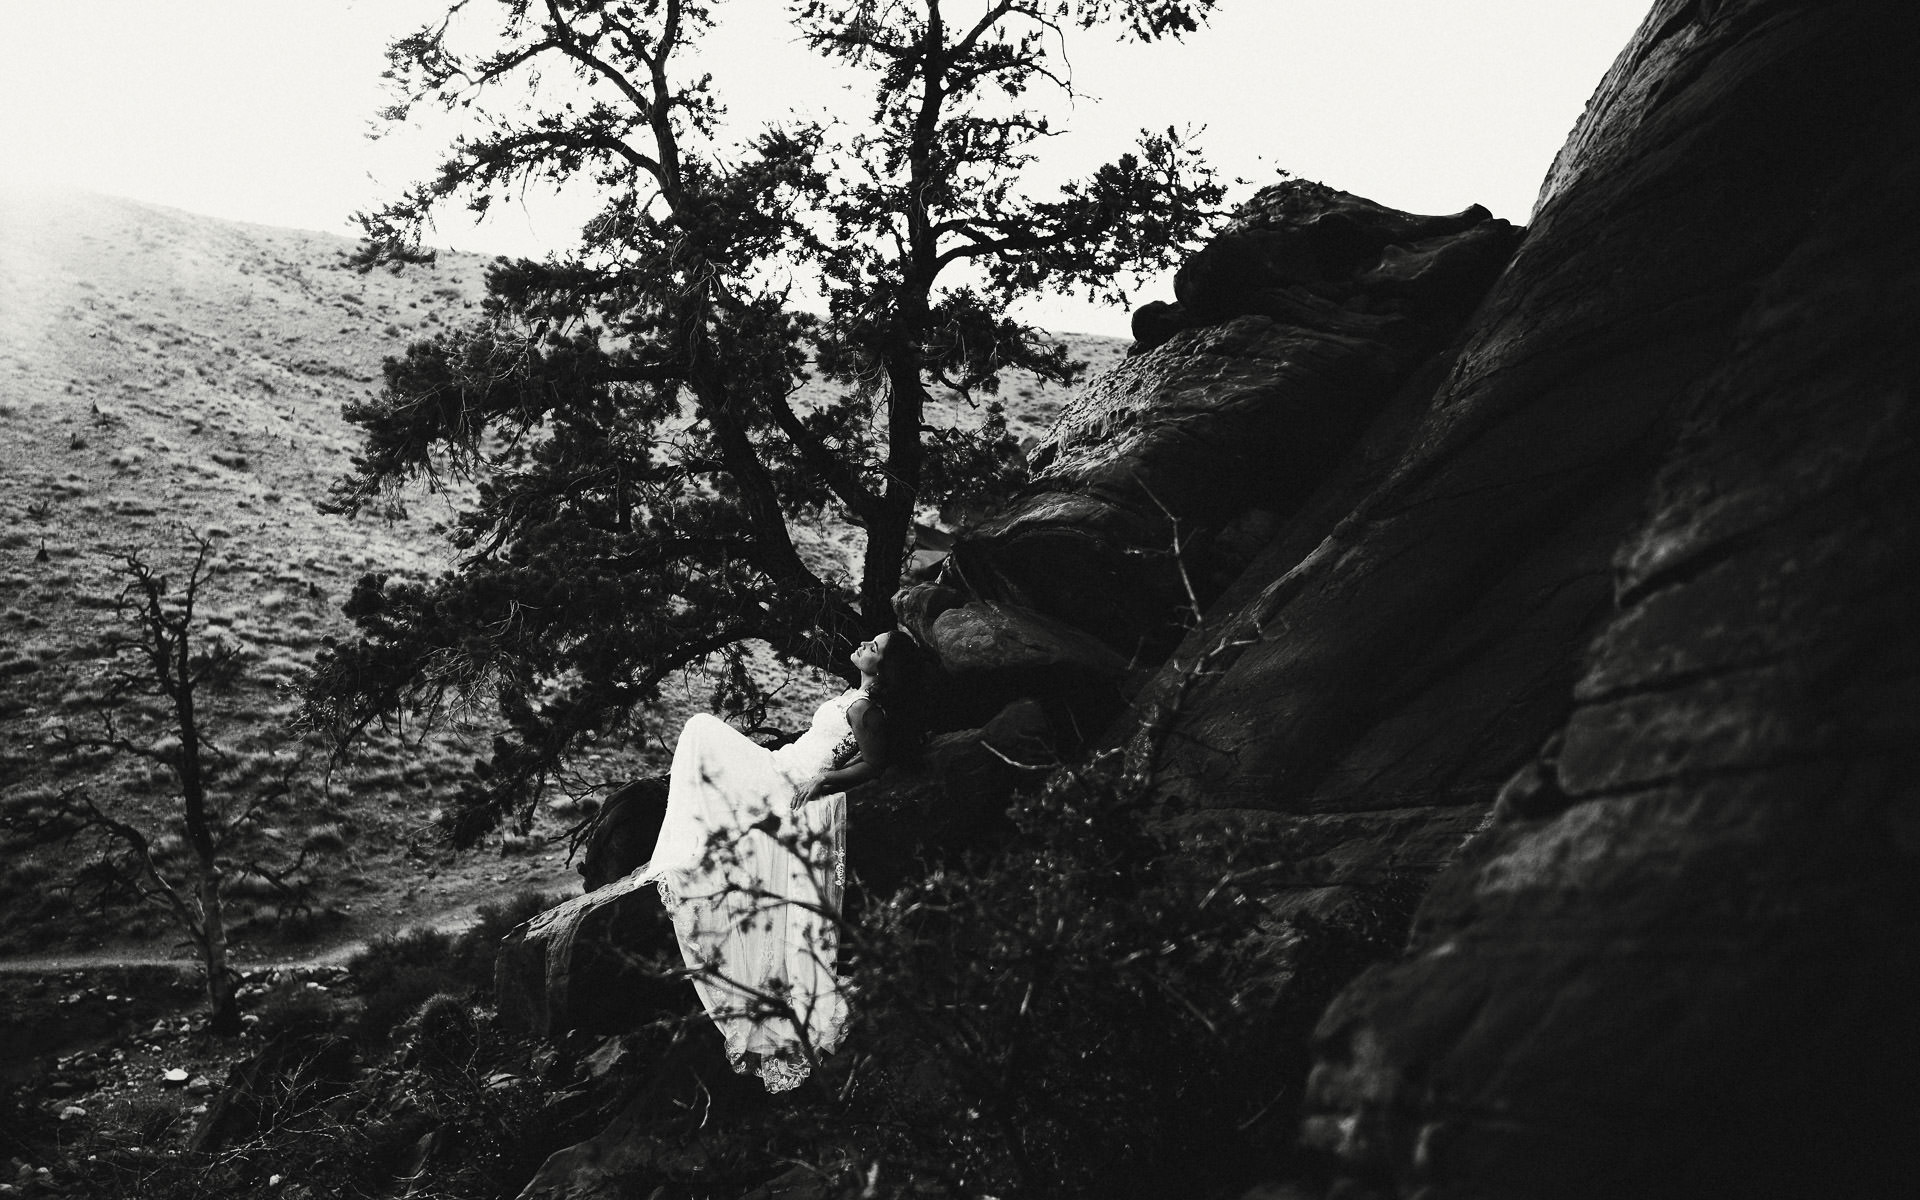 Twisted-Oaks-Studio-wppi-leica-red-rock-canyon-40.jpg